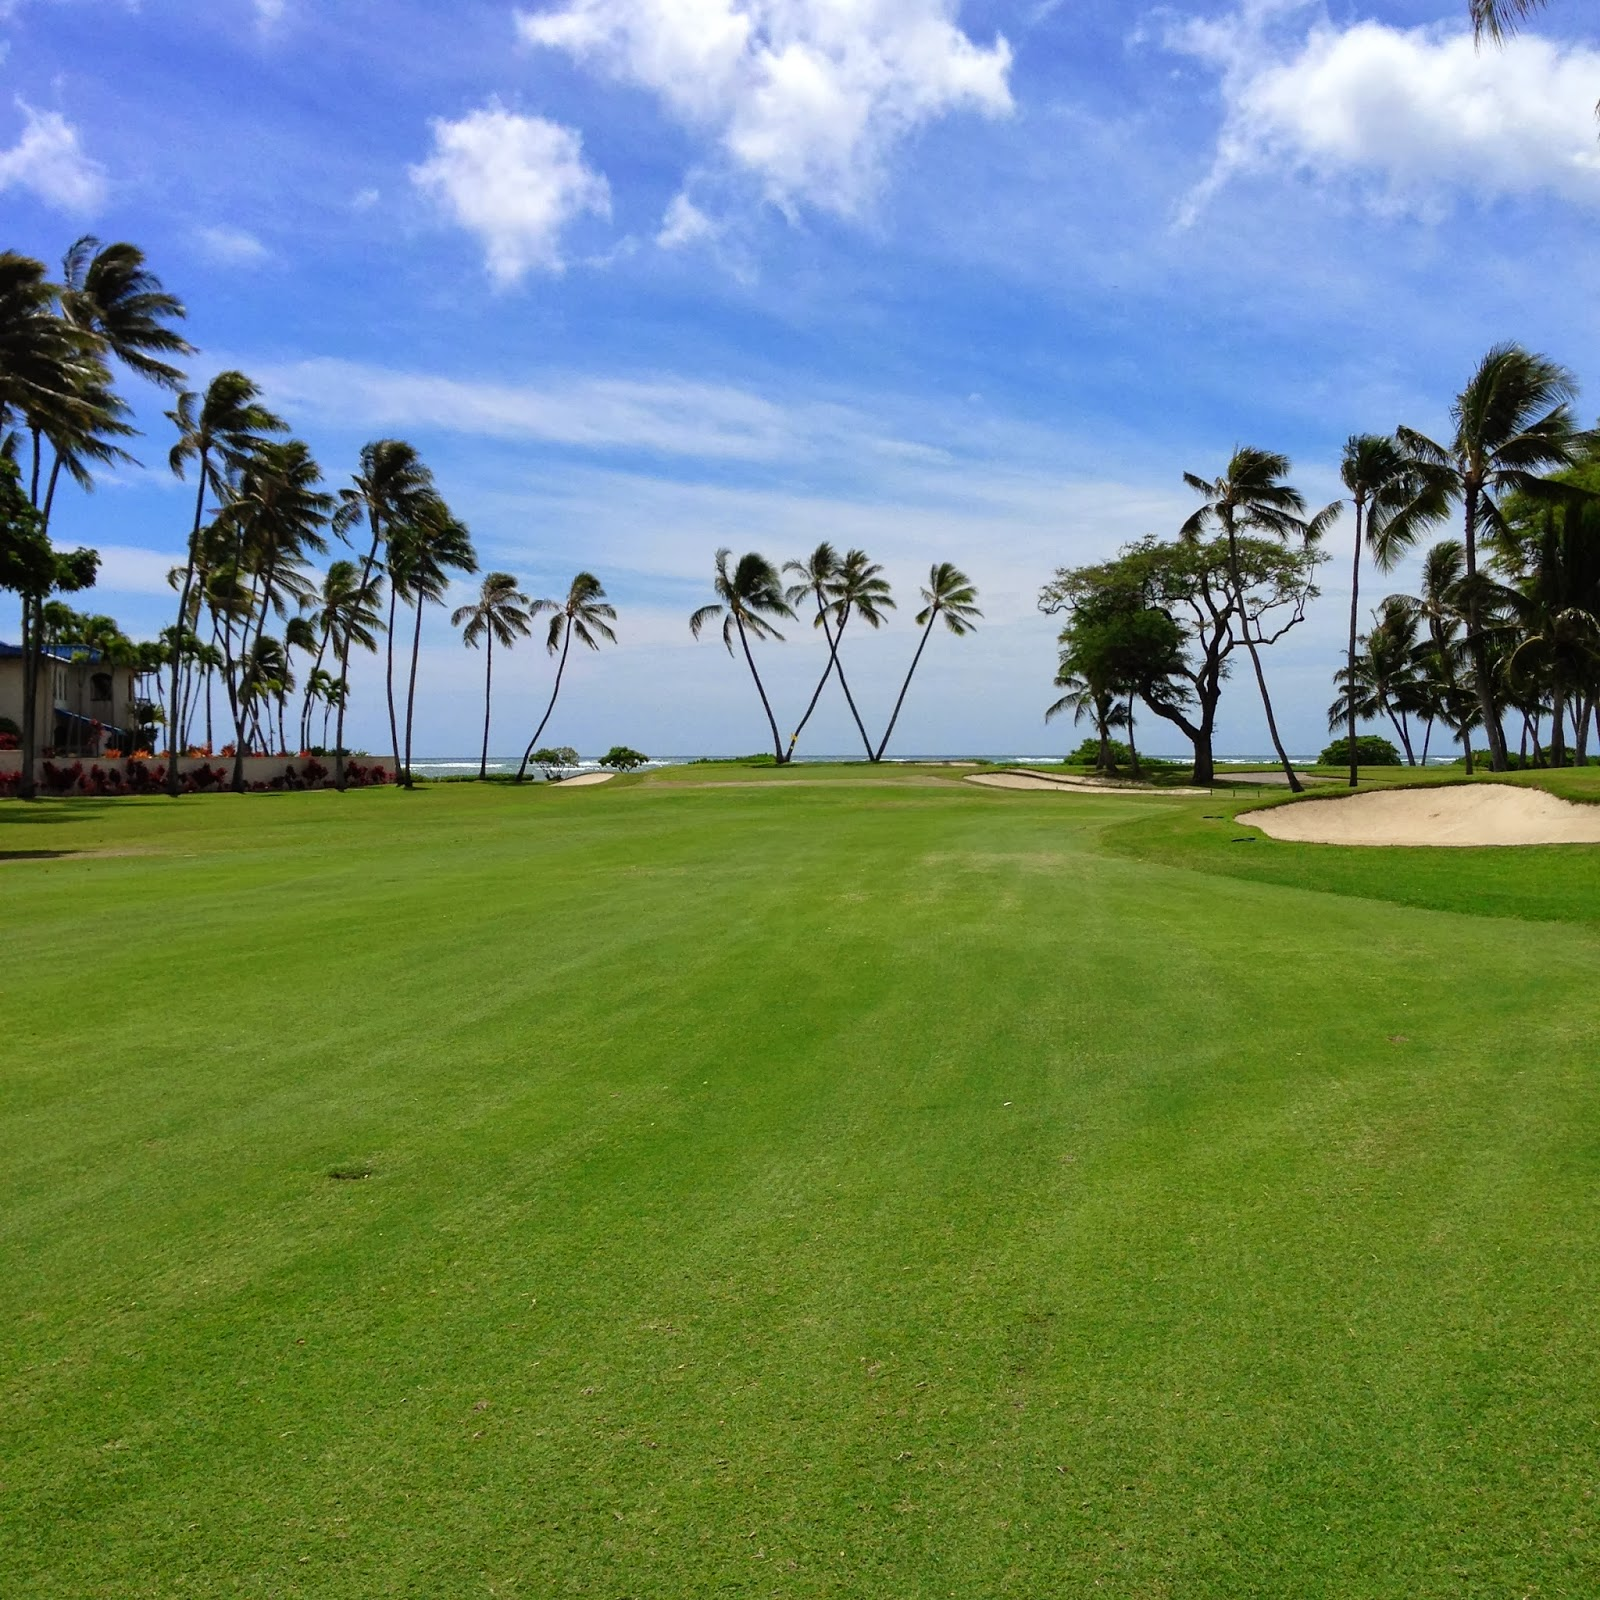 TASTE OF HAWAII WAIALAE COUNTRY CLUB